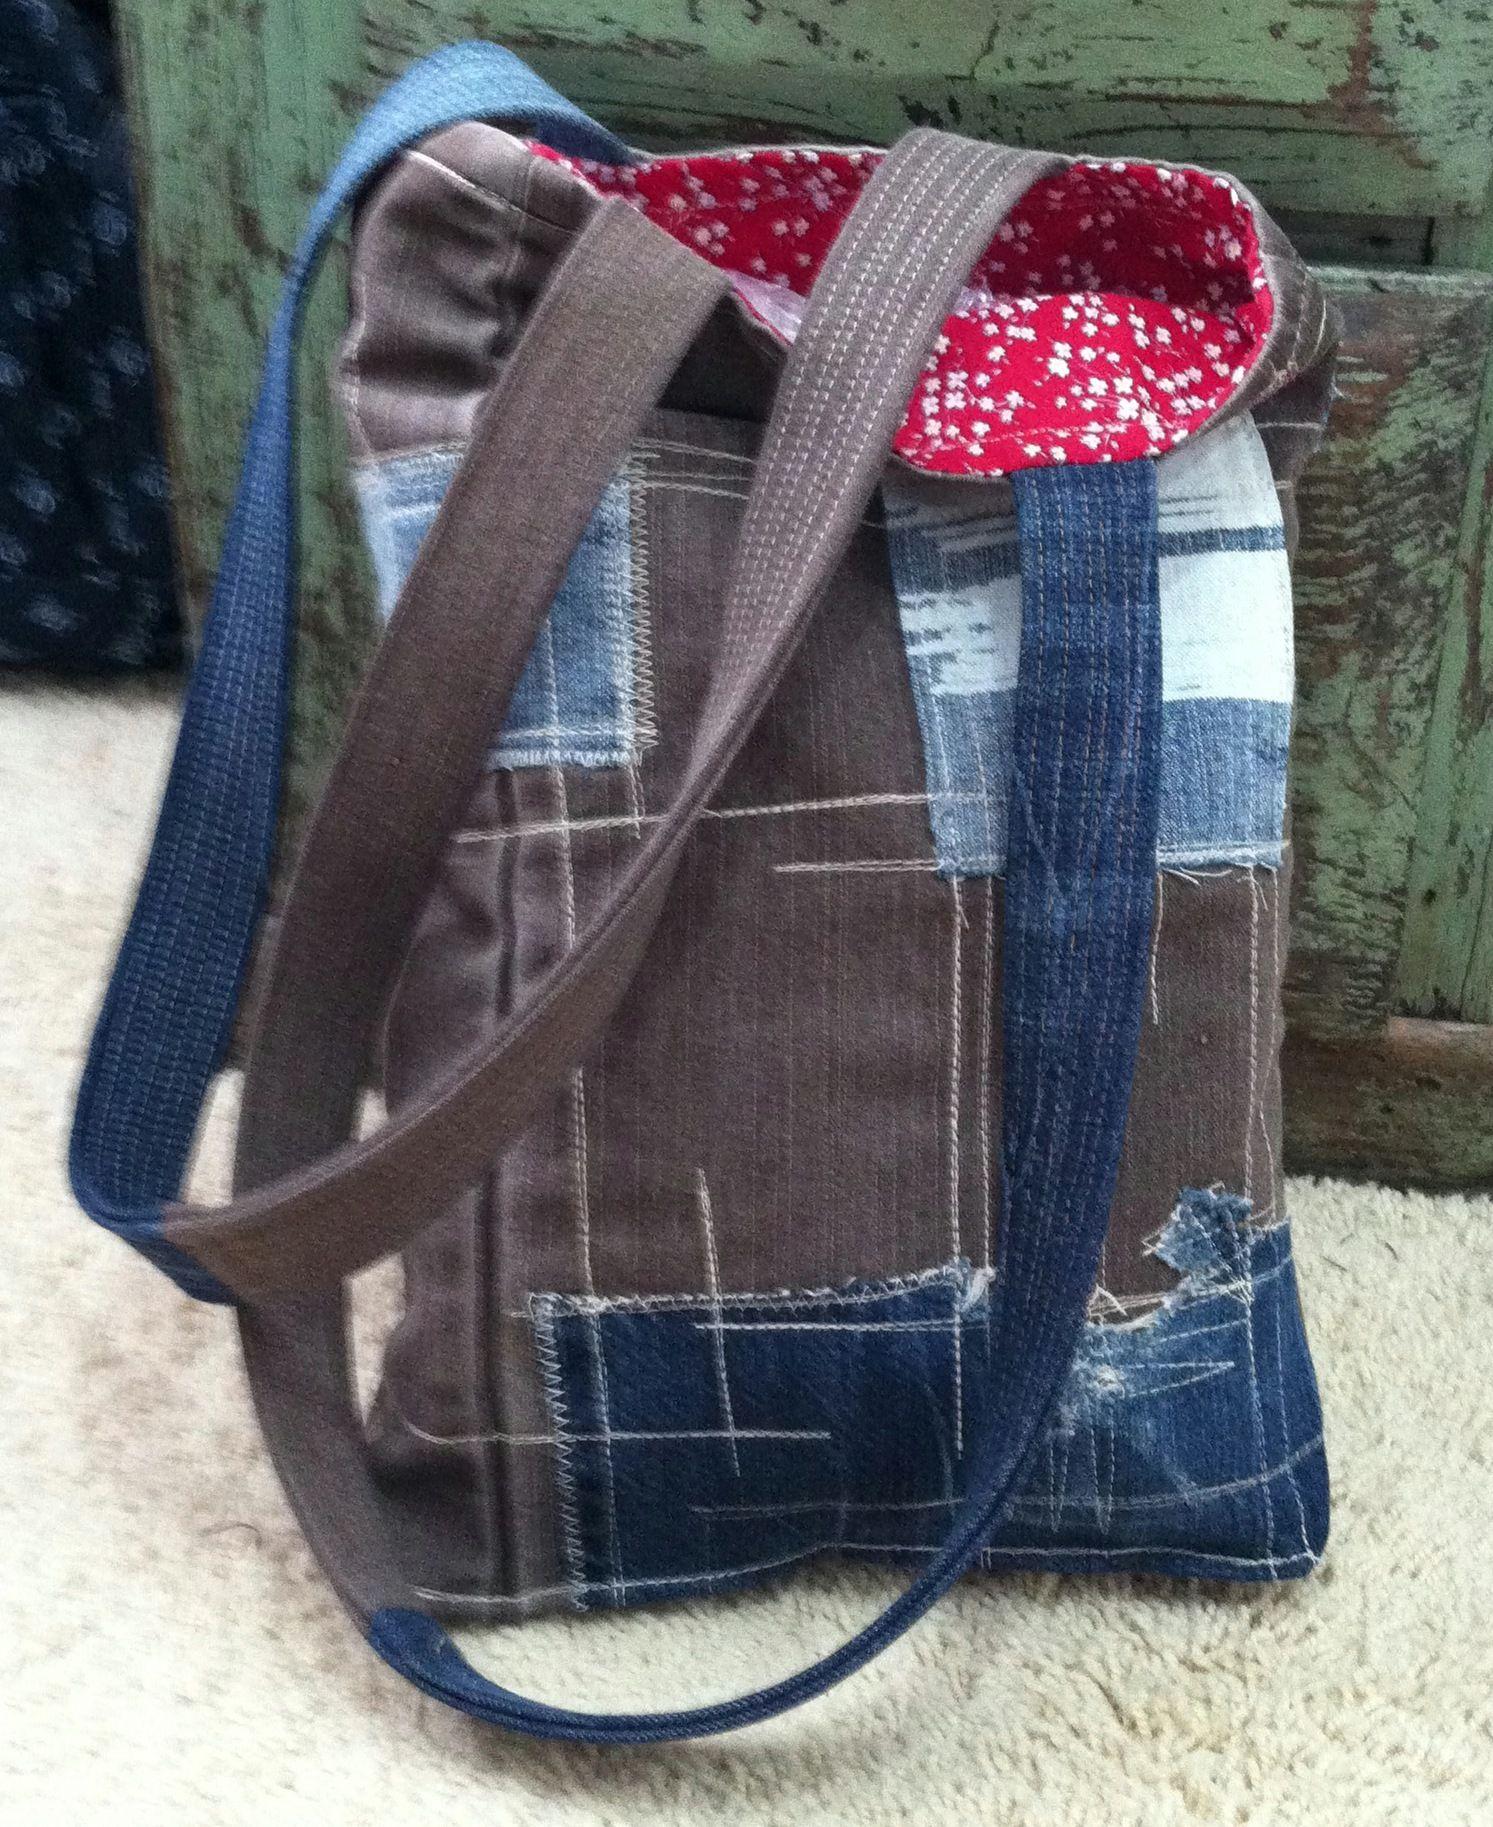 tasche patchwork jeans upcycling taschen jeans. Black Bedroom Furniture Sets. Home Design Ideas